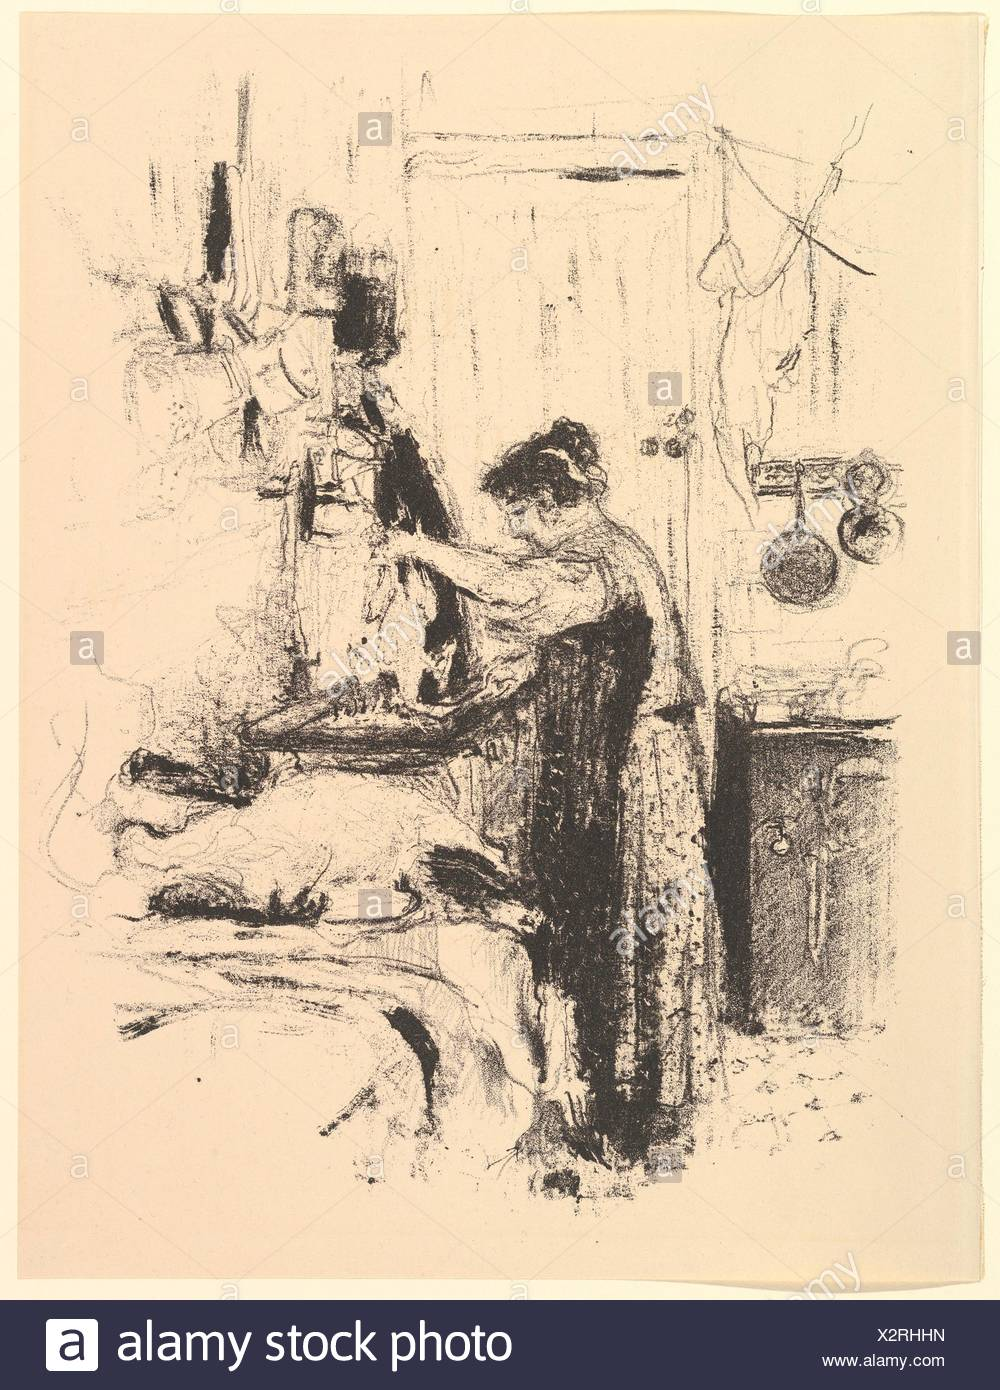 Cuisine Artise | La Flambee Platte 5 Von La Cuisine Artist Edouard Vuillard